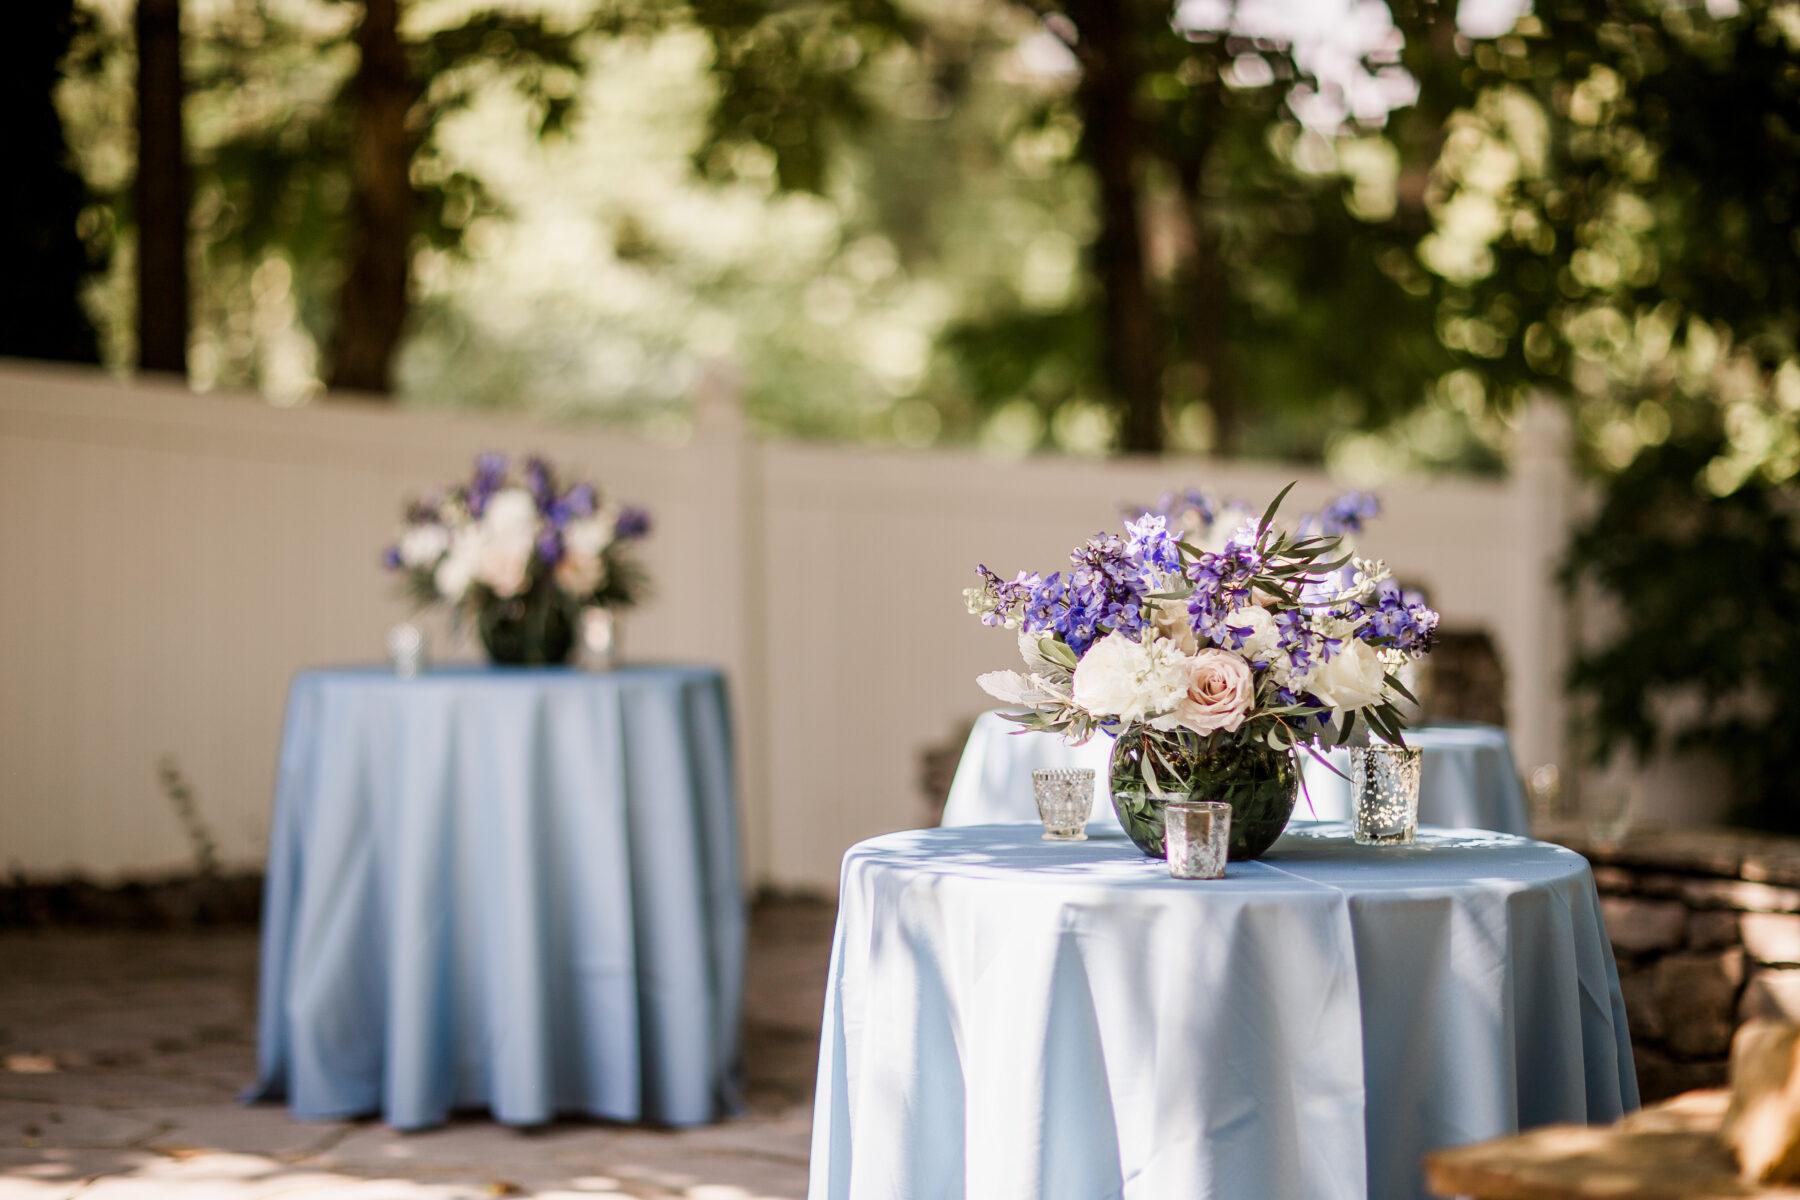 Outdoor garden wedding at CJ's Off the Square   Nashville Bride Guide